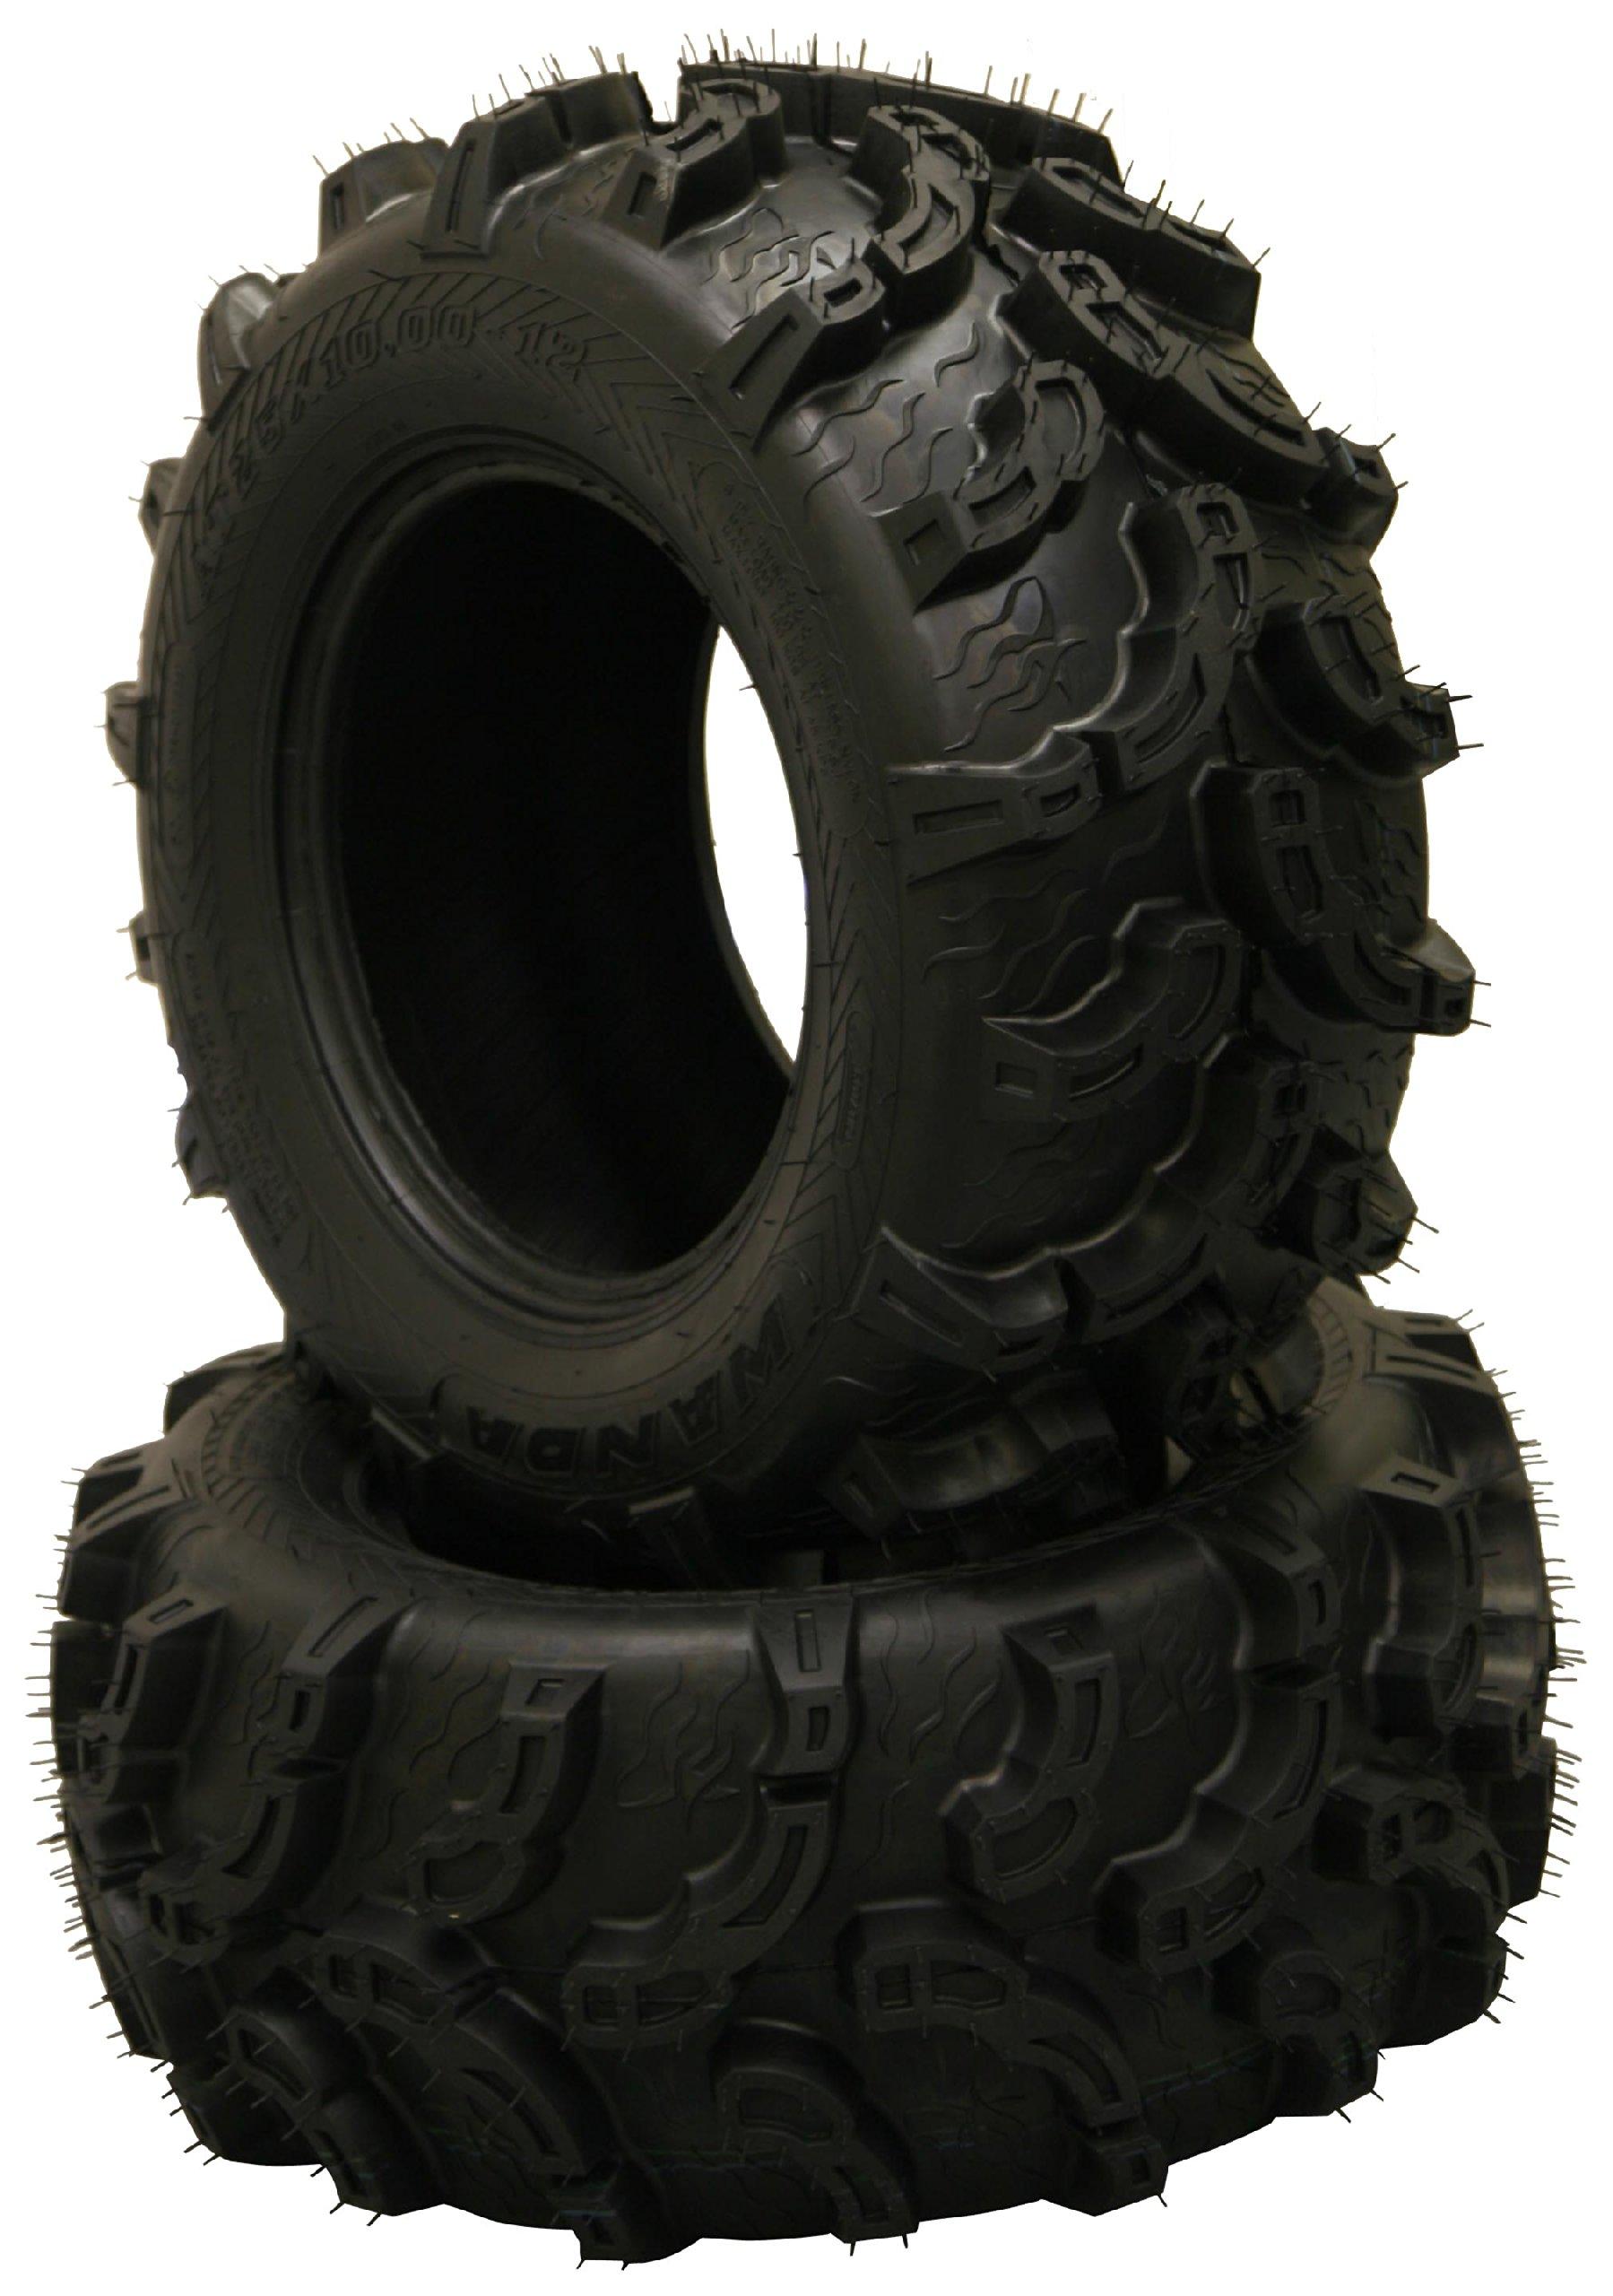 Set of 4 New Premium WANDA ATV/UTV Tires 27x9-12 Front & 27x12-12 Rear /6PR P375 10219/10220 by Wanda (Image #4)